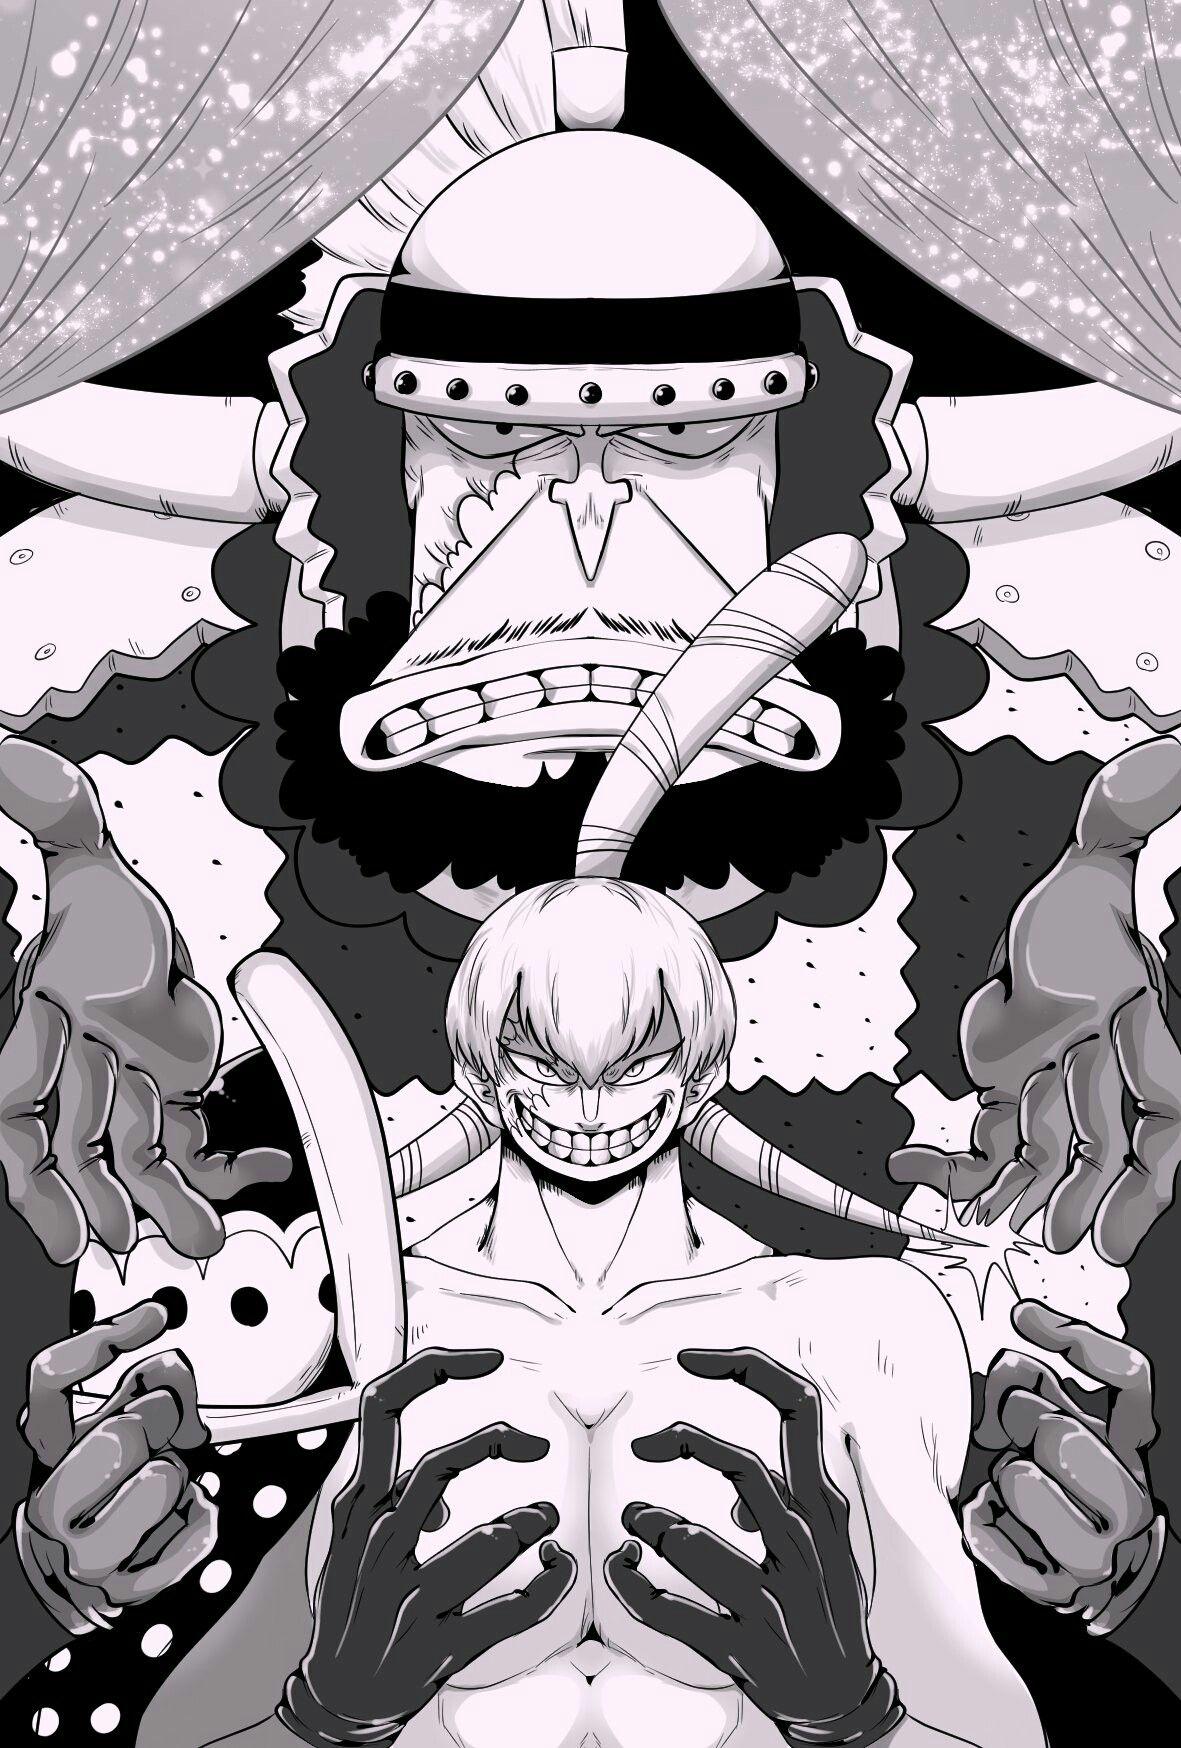 Pin By Wumpy On One Piece Big Mom Pirates Hot Anime Boy Anime